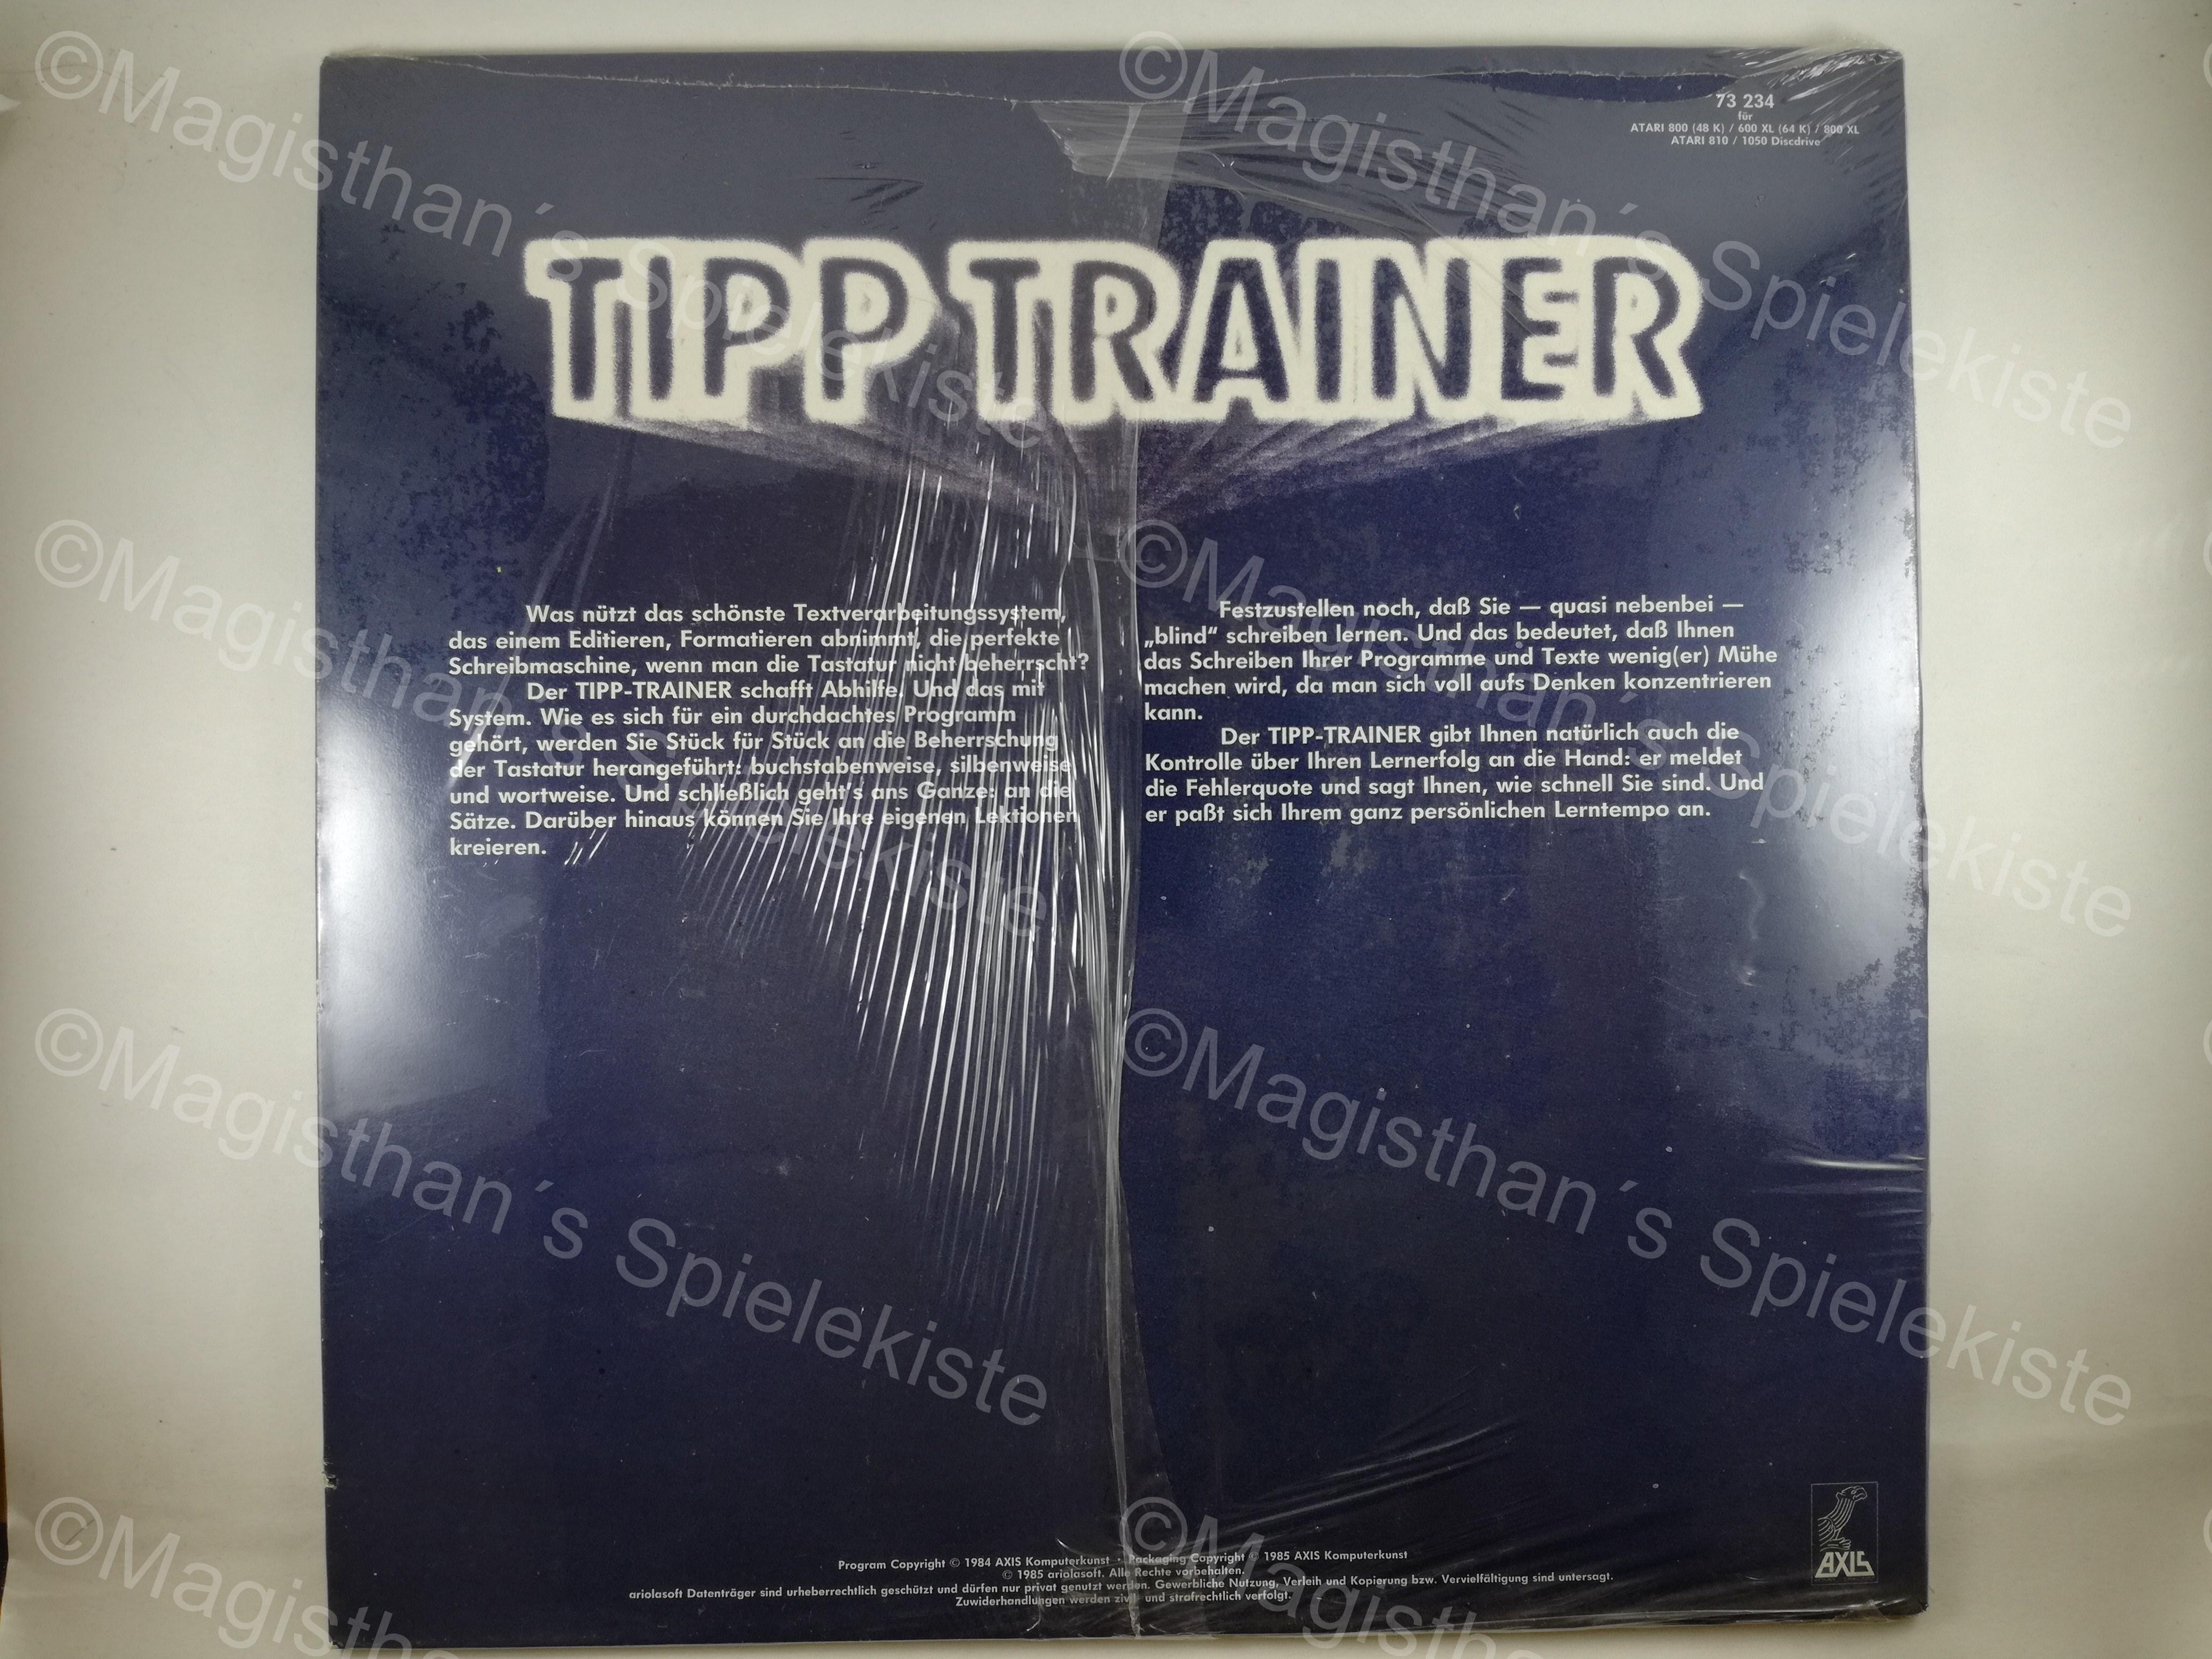 TippTrainerAtari_back.jpg